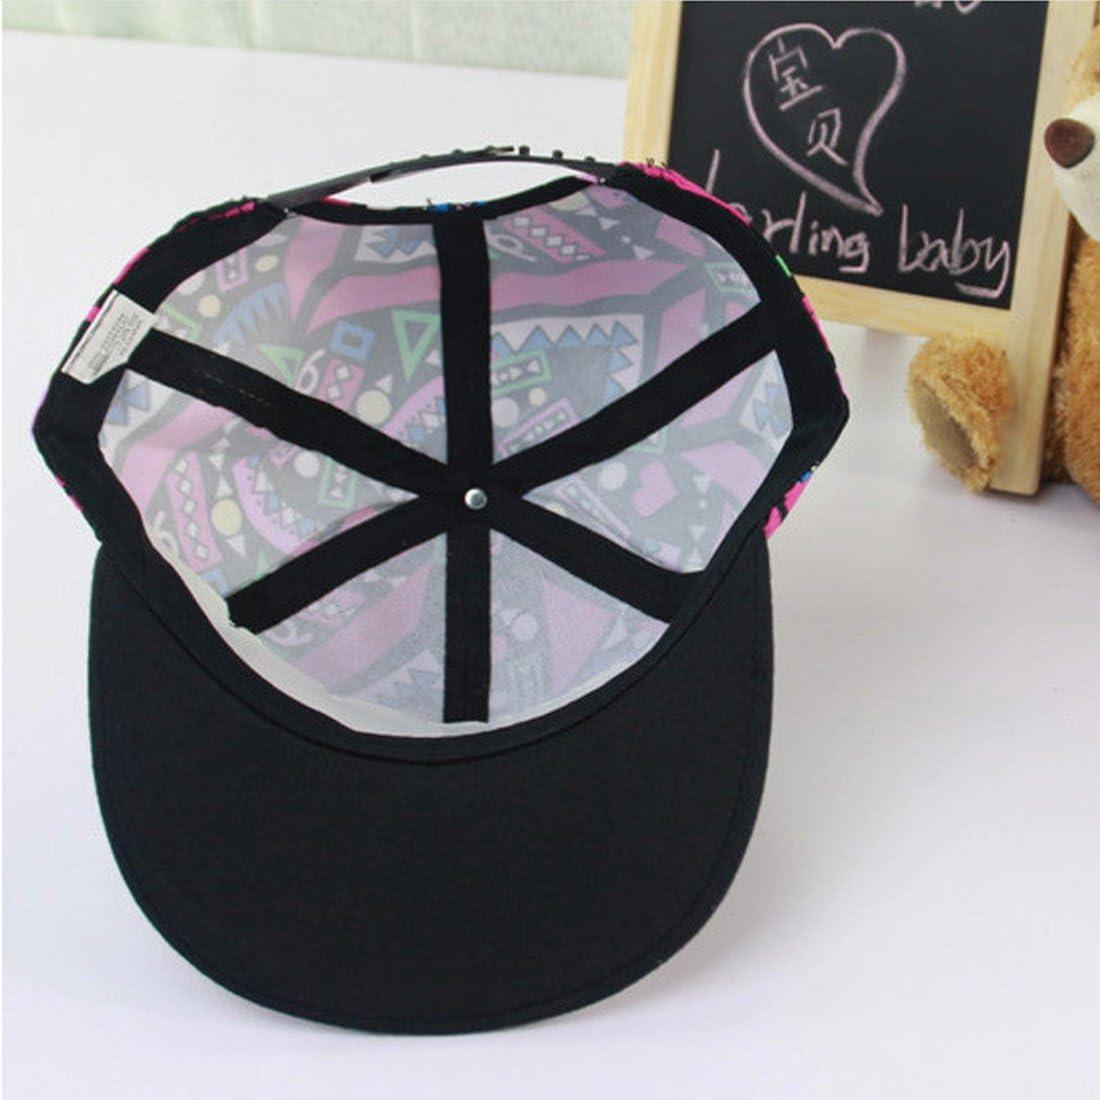 Belsen Bambino Hip-Hop lettera stampato Cap Baseball Cappello